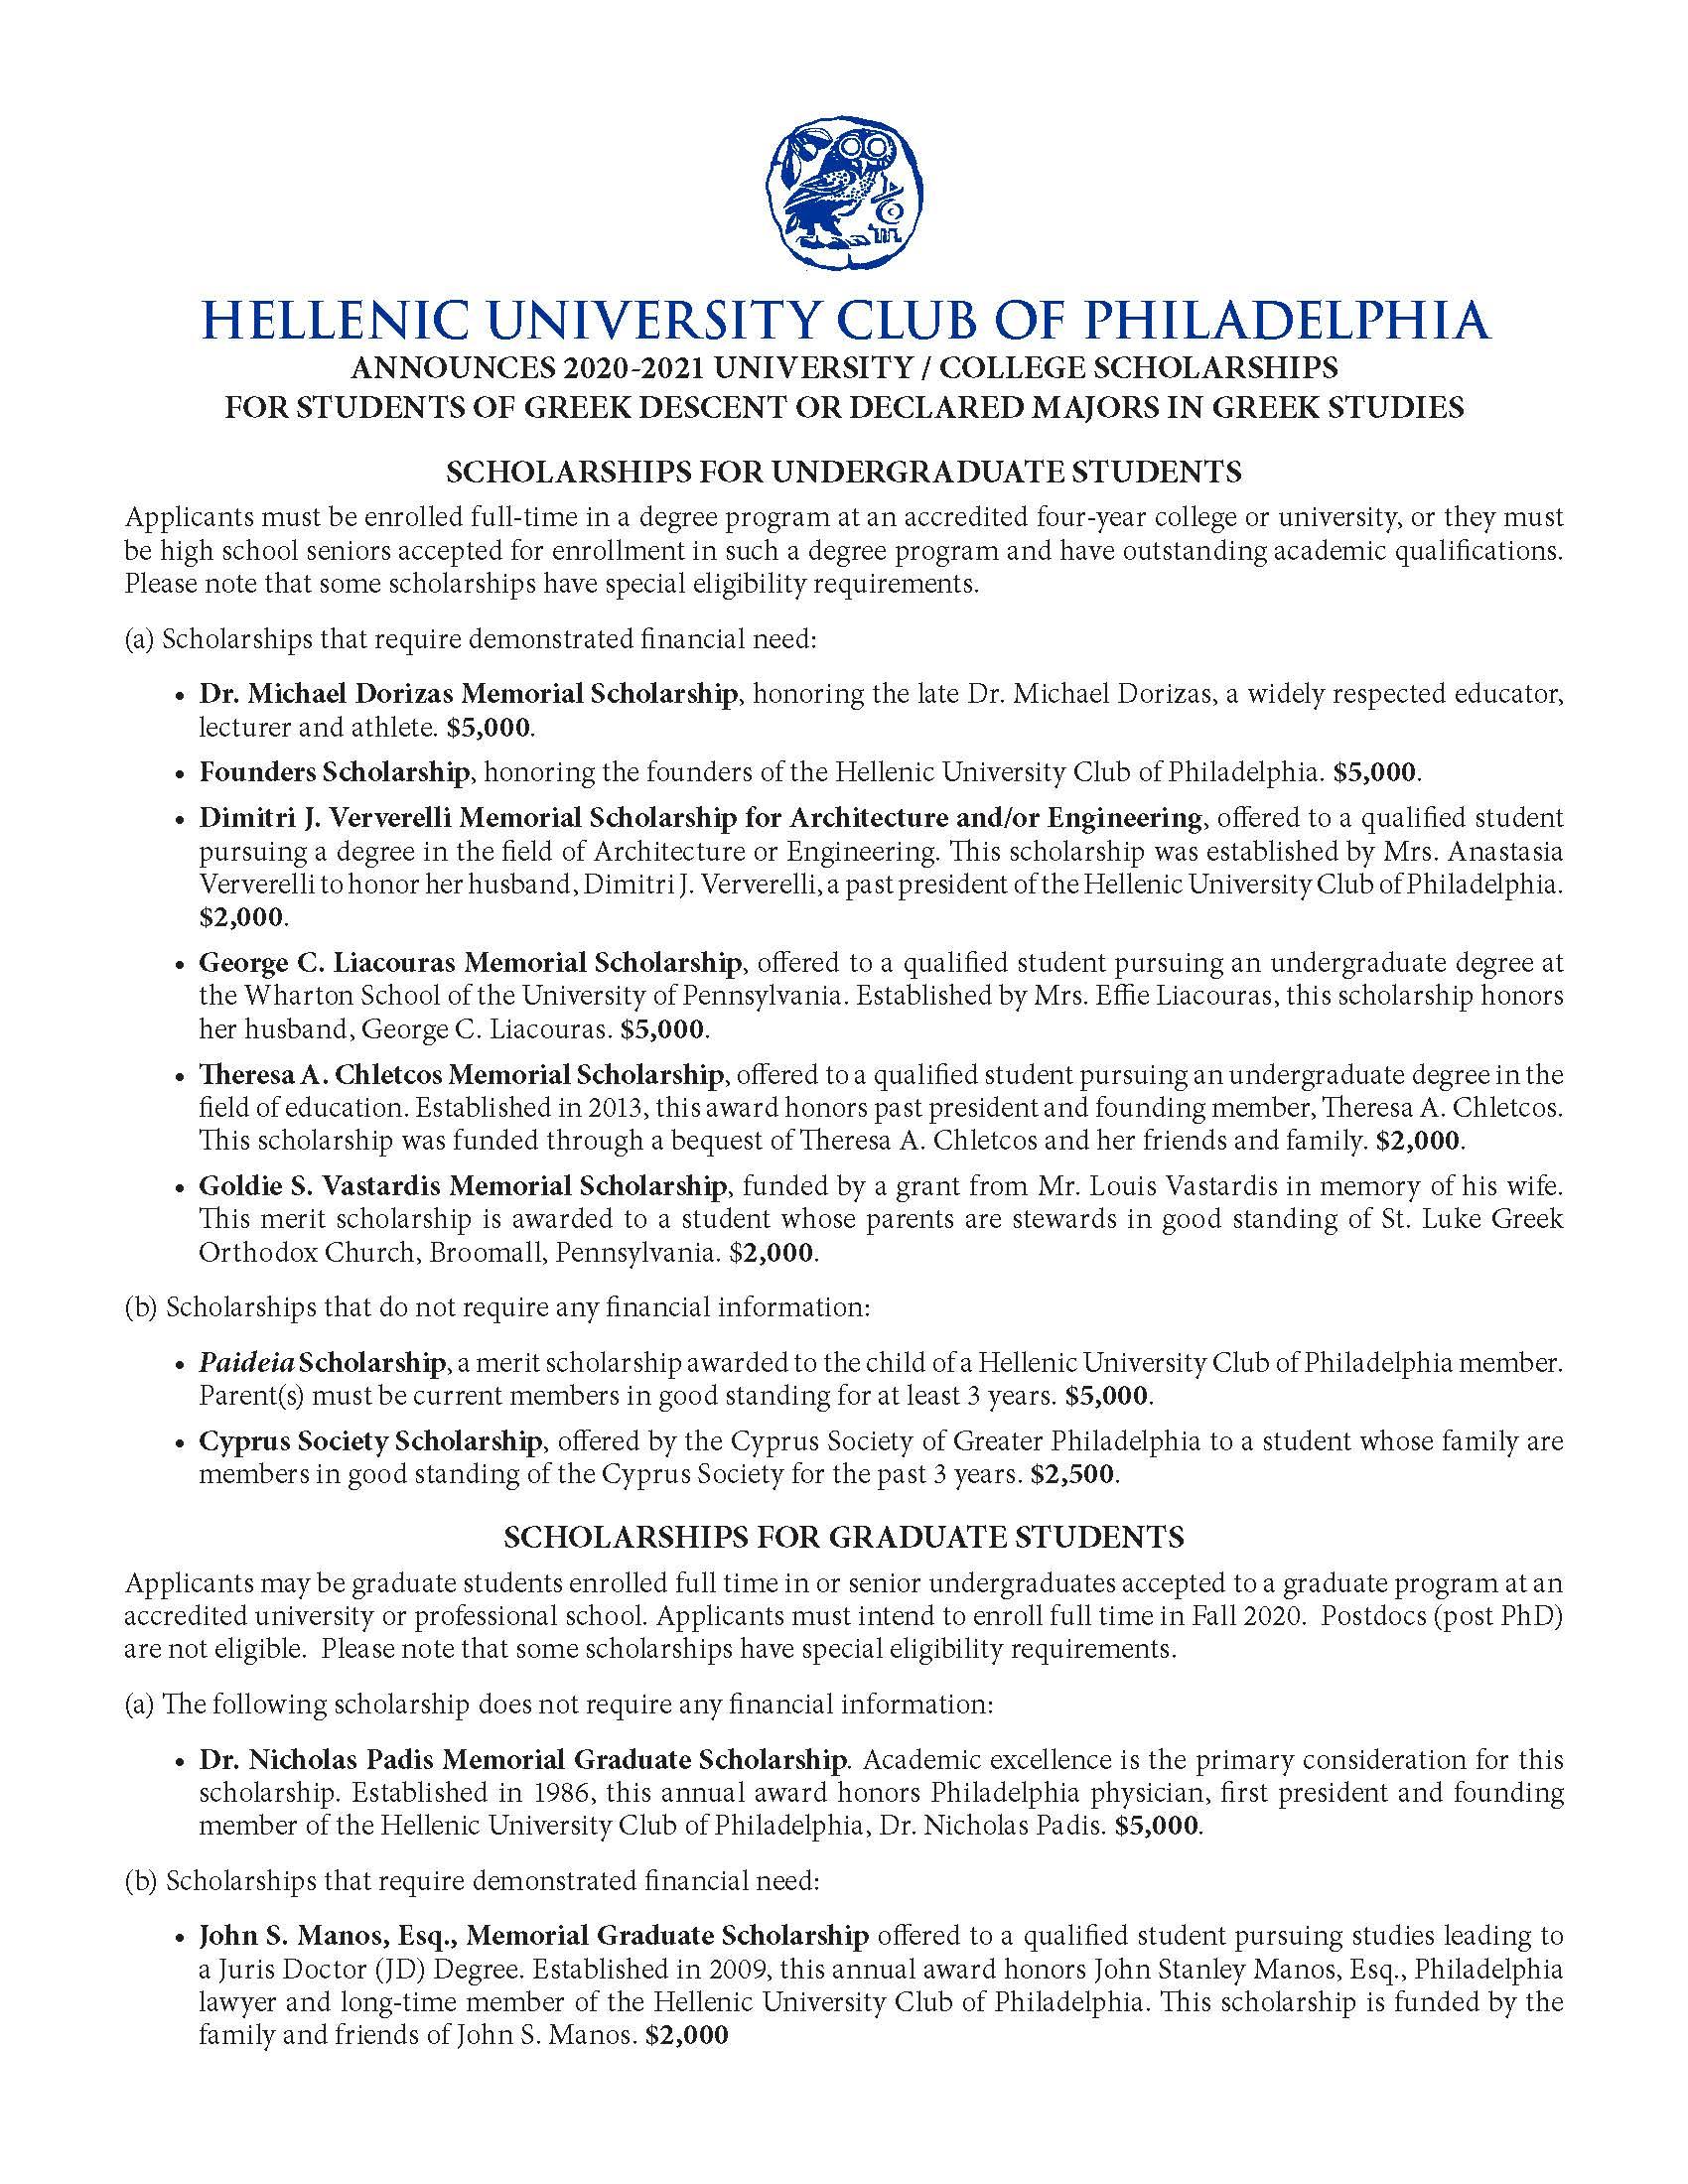 2020-2021 HUC Scholarship Announcement_Page_1